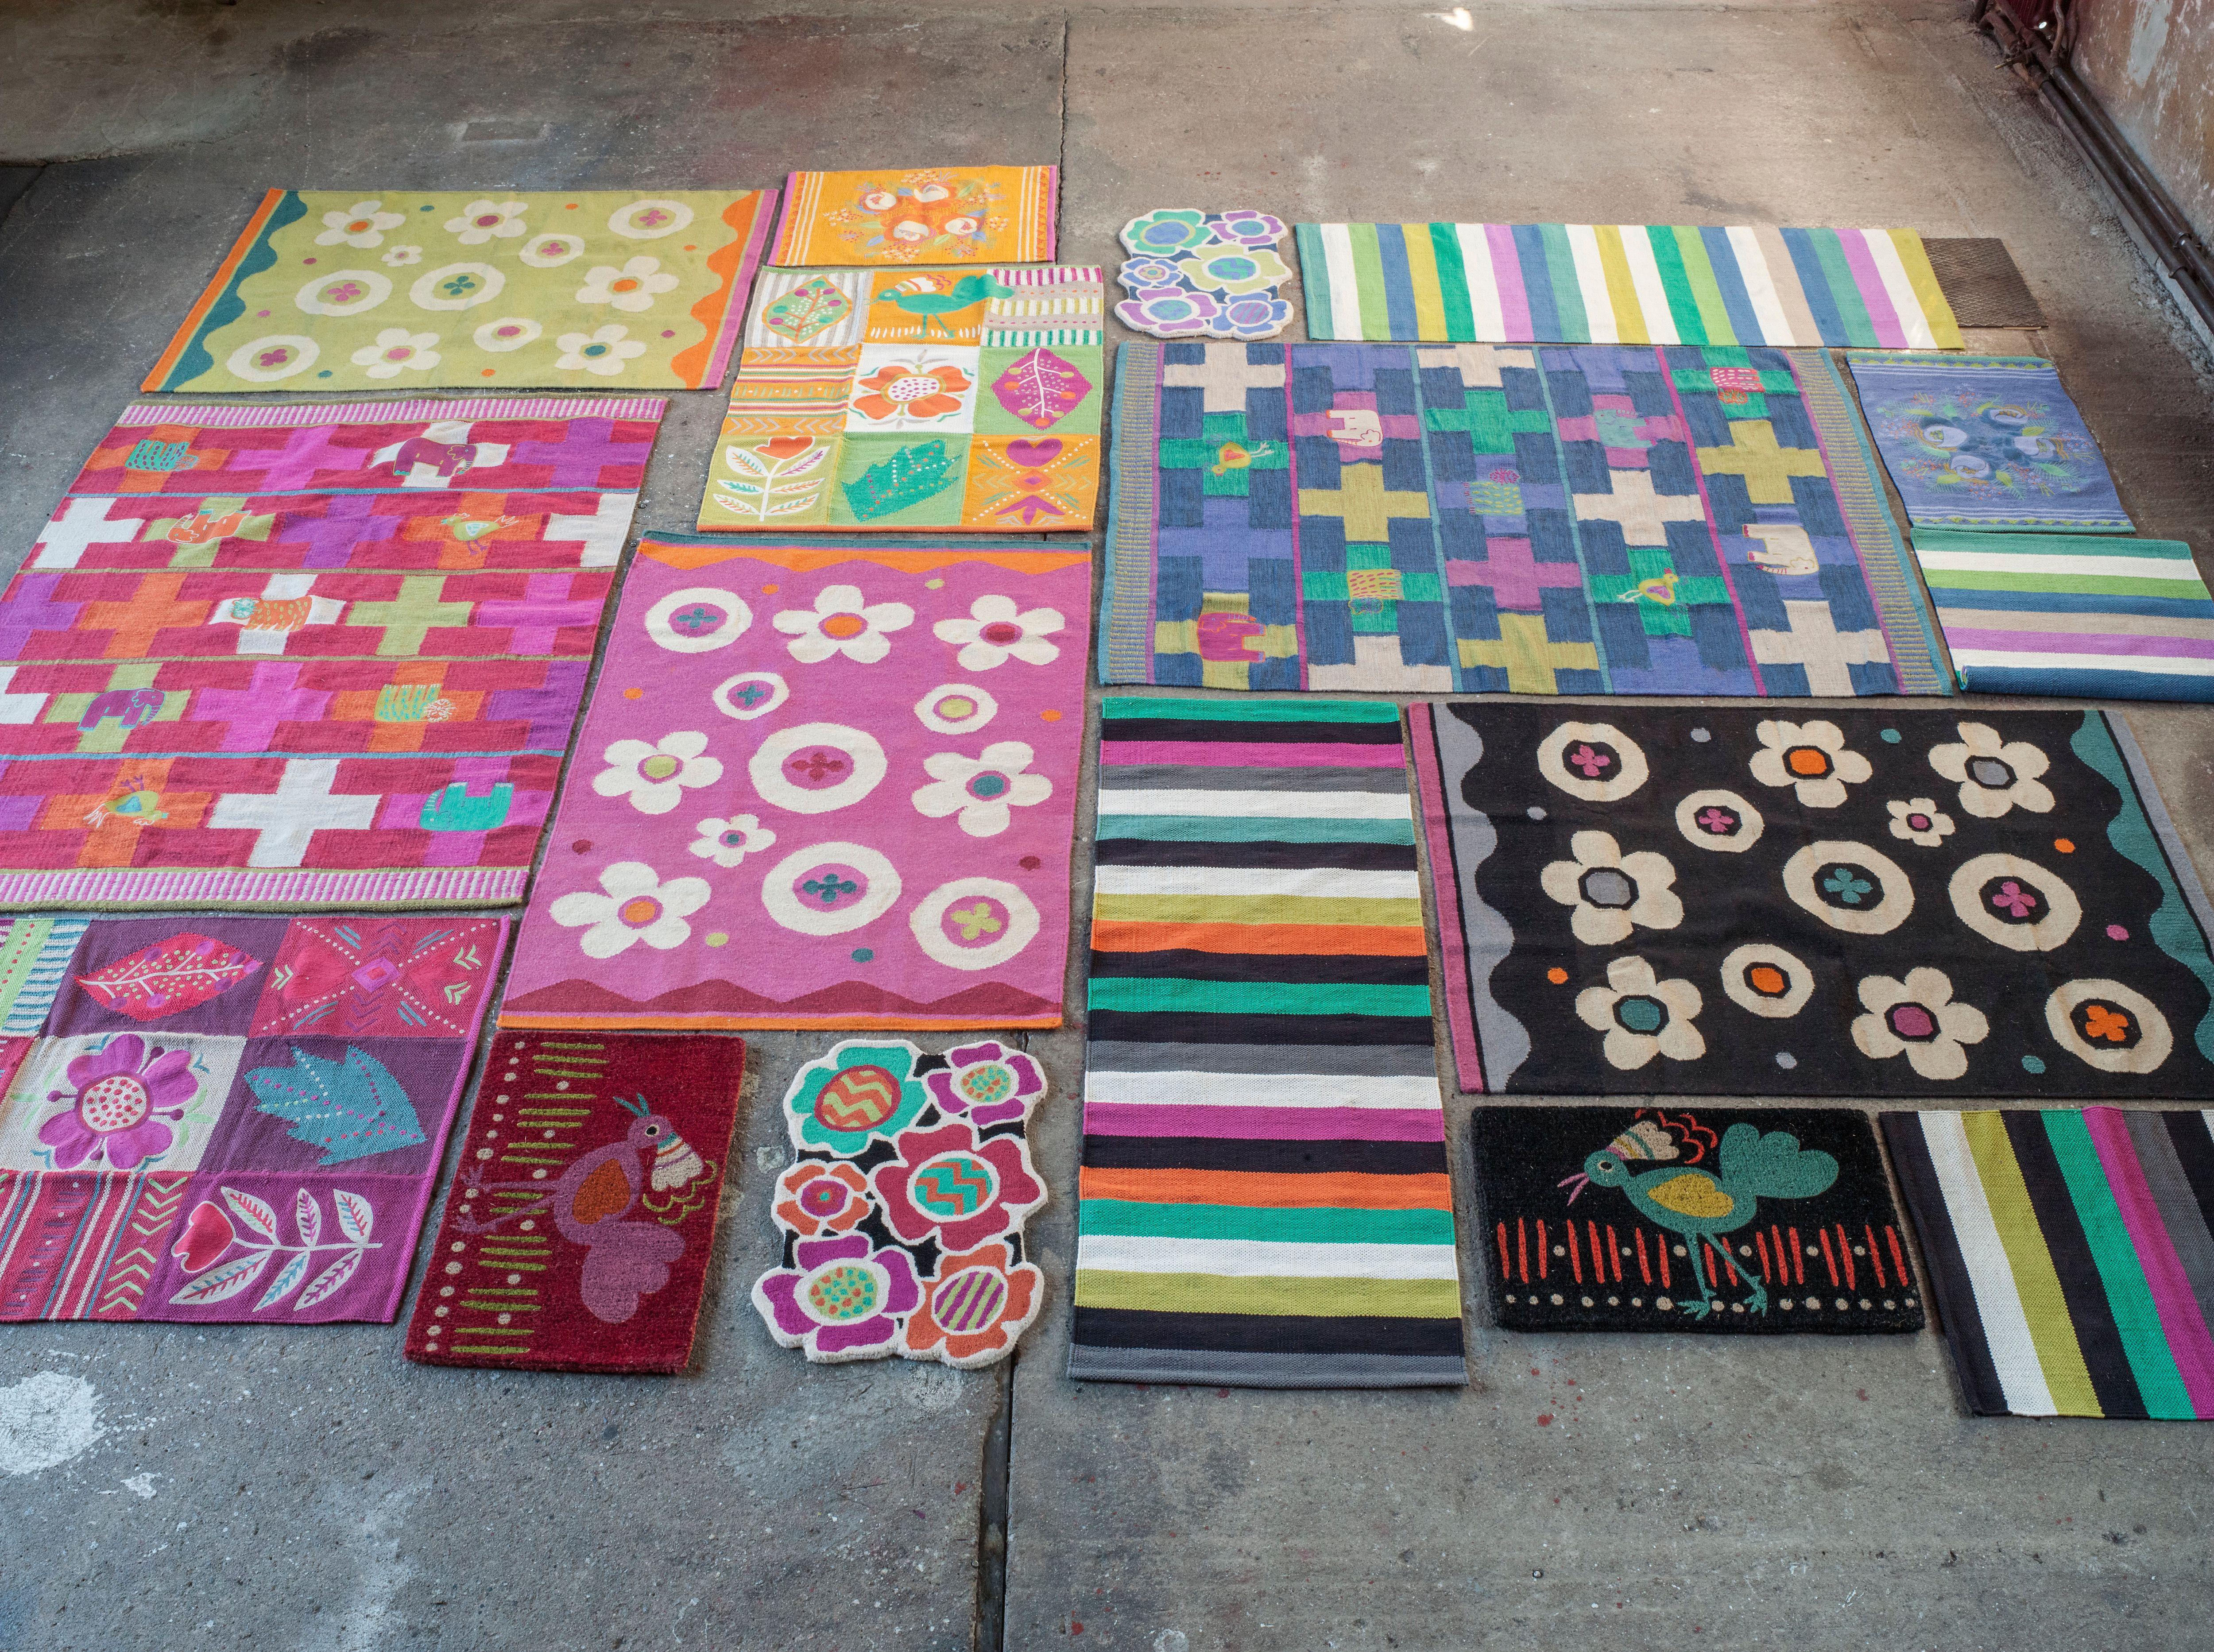 gudrun sj d ns sommerkollektion 2015 farbstarke und. Black Bedroom Furniture Sets. Home Design Ideas